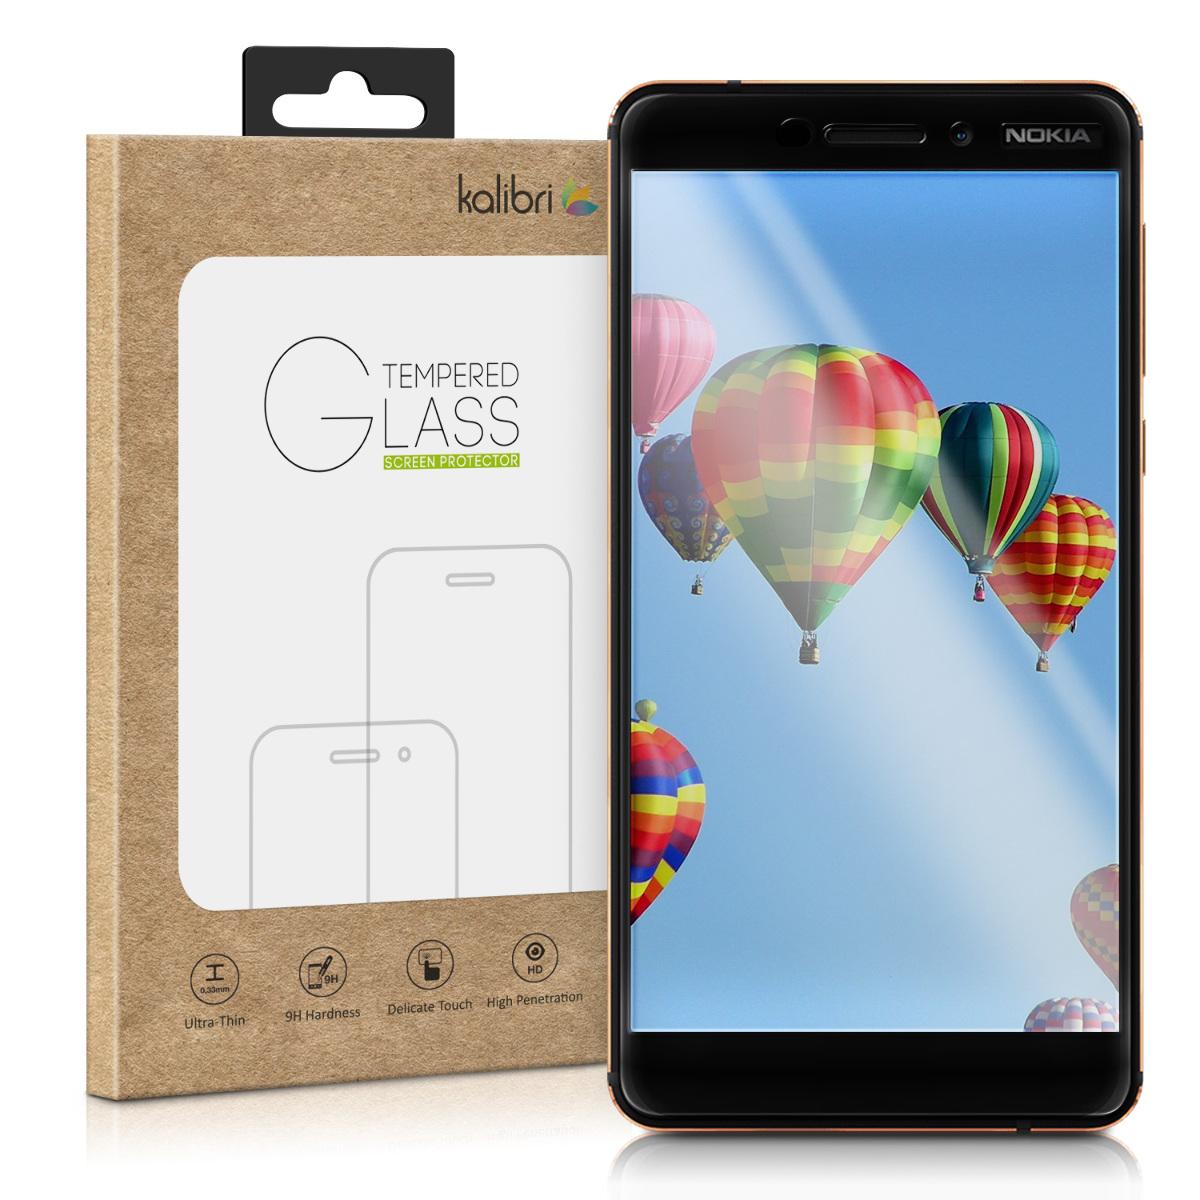 Kalibri Tempered Glass - Fullface Αντιχαρακτικό Γυαλί Οθόνης Nokia 6.1 2018 - Black Frame (45990.01)